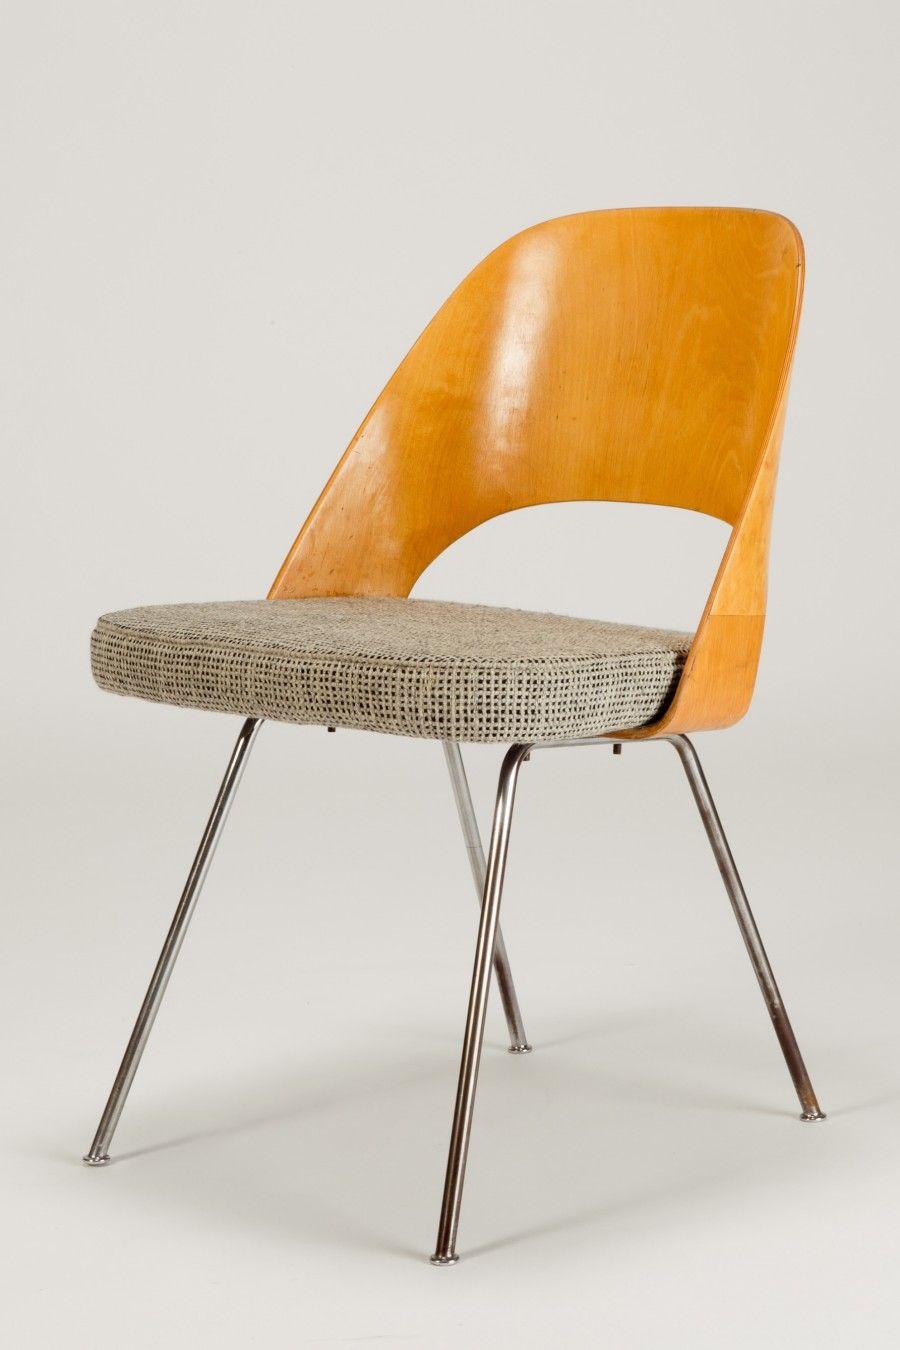 Eero Saarinen; Molded Birch Plywood and Chromed Steel Chair for Knoll International, 1950.